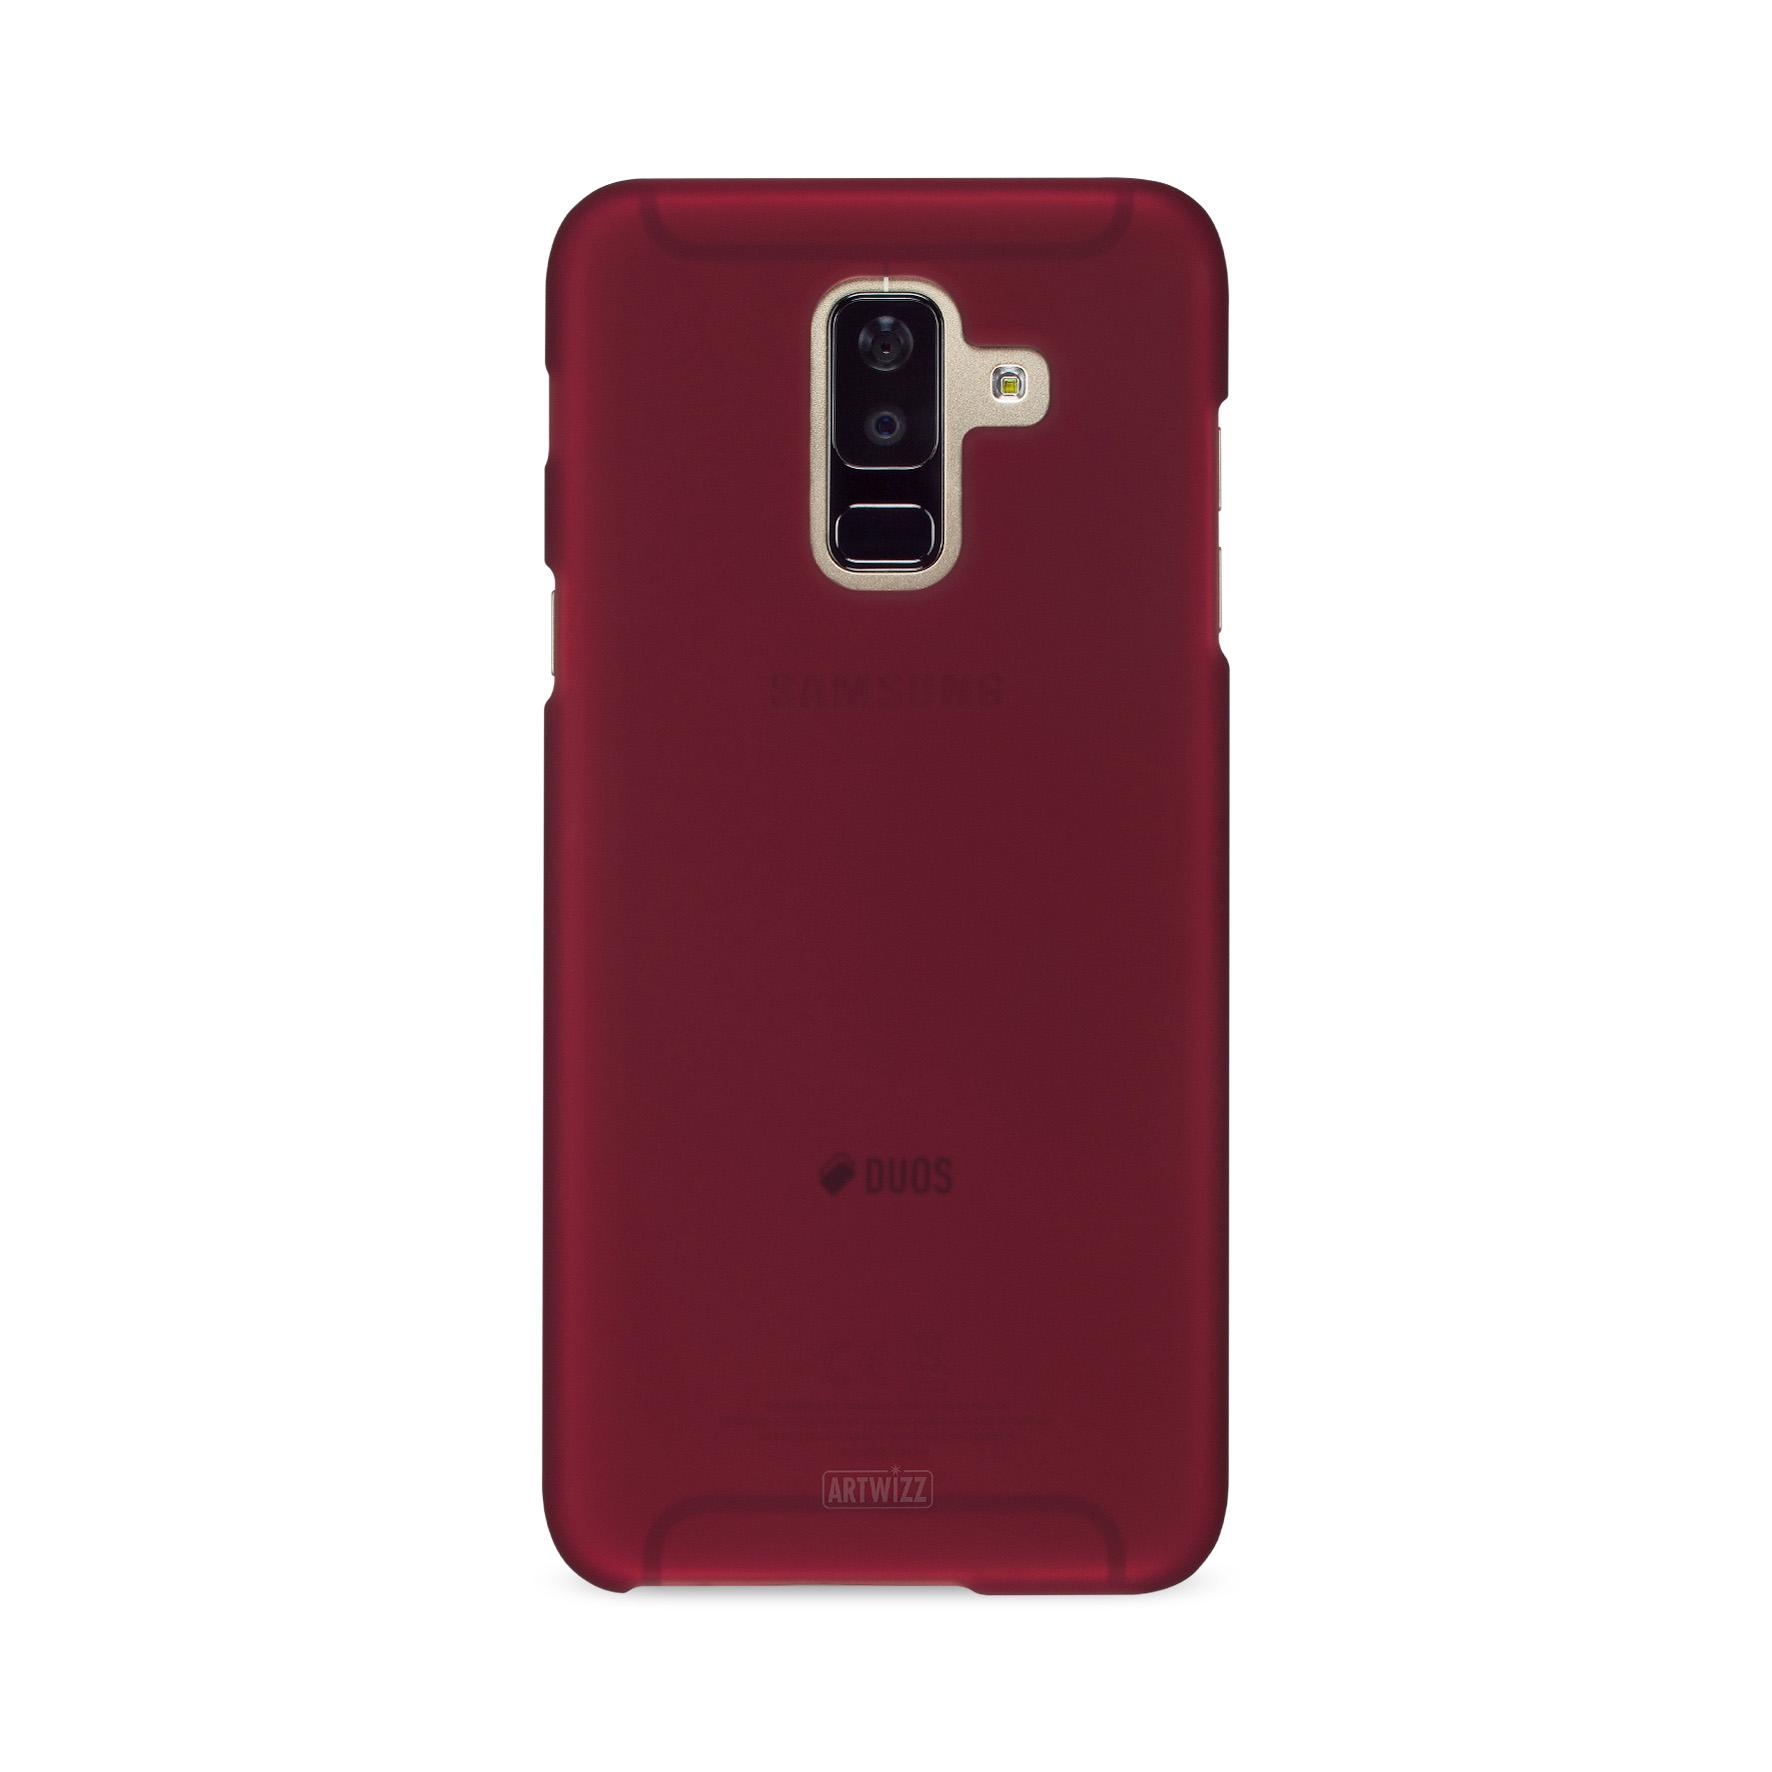 Artwizz Rubber Clip Case Fur Samsung Galaxy A6 Plus 2018 Design